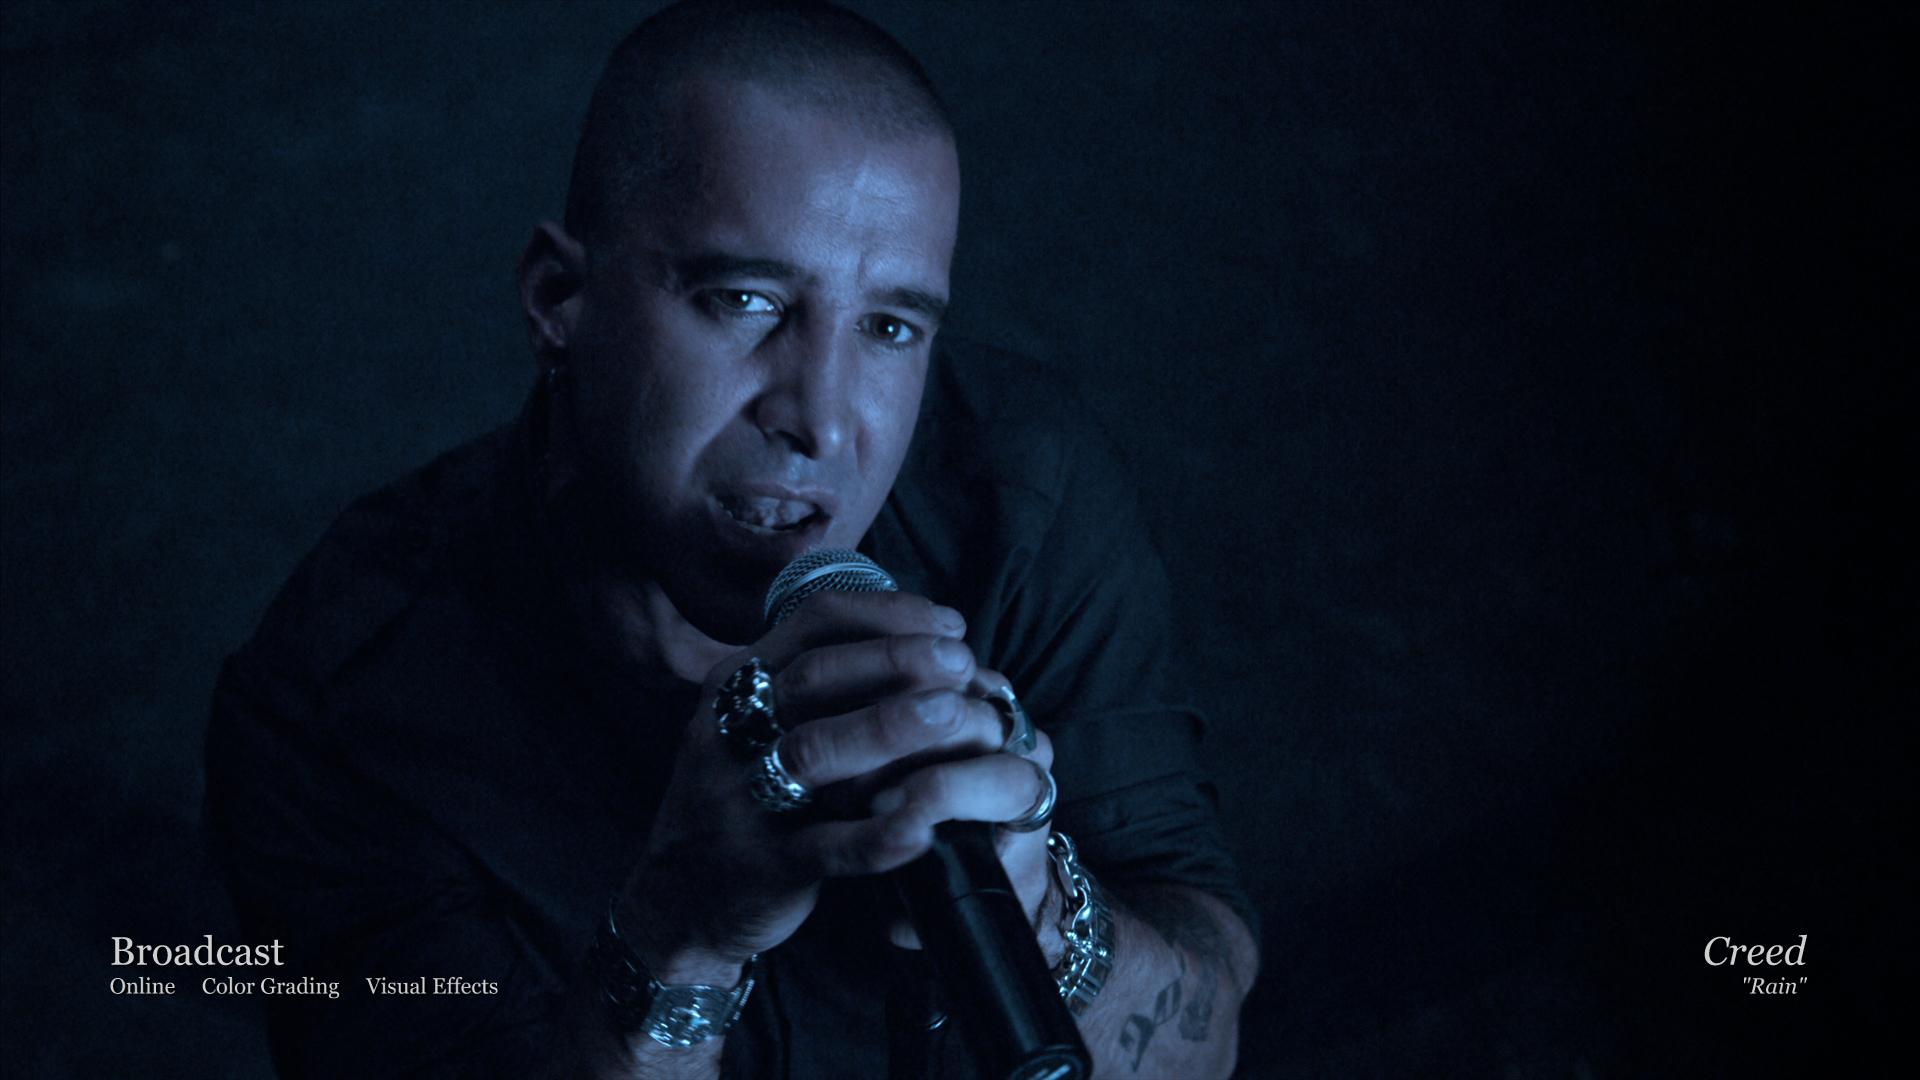 Creed - Music Video